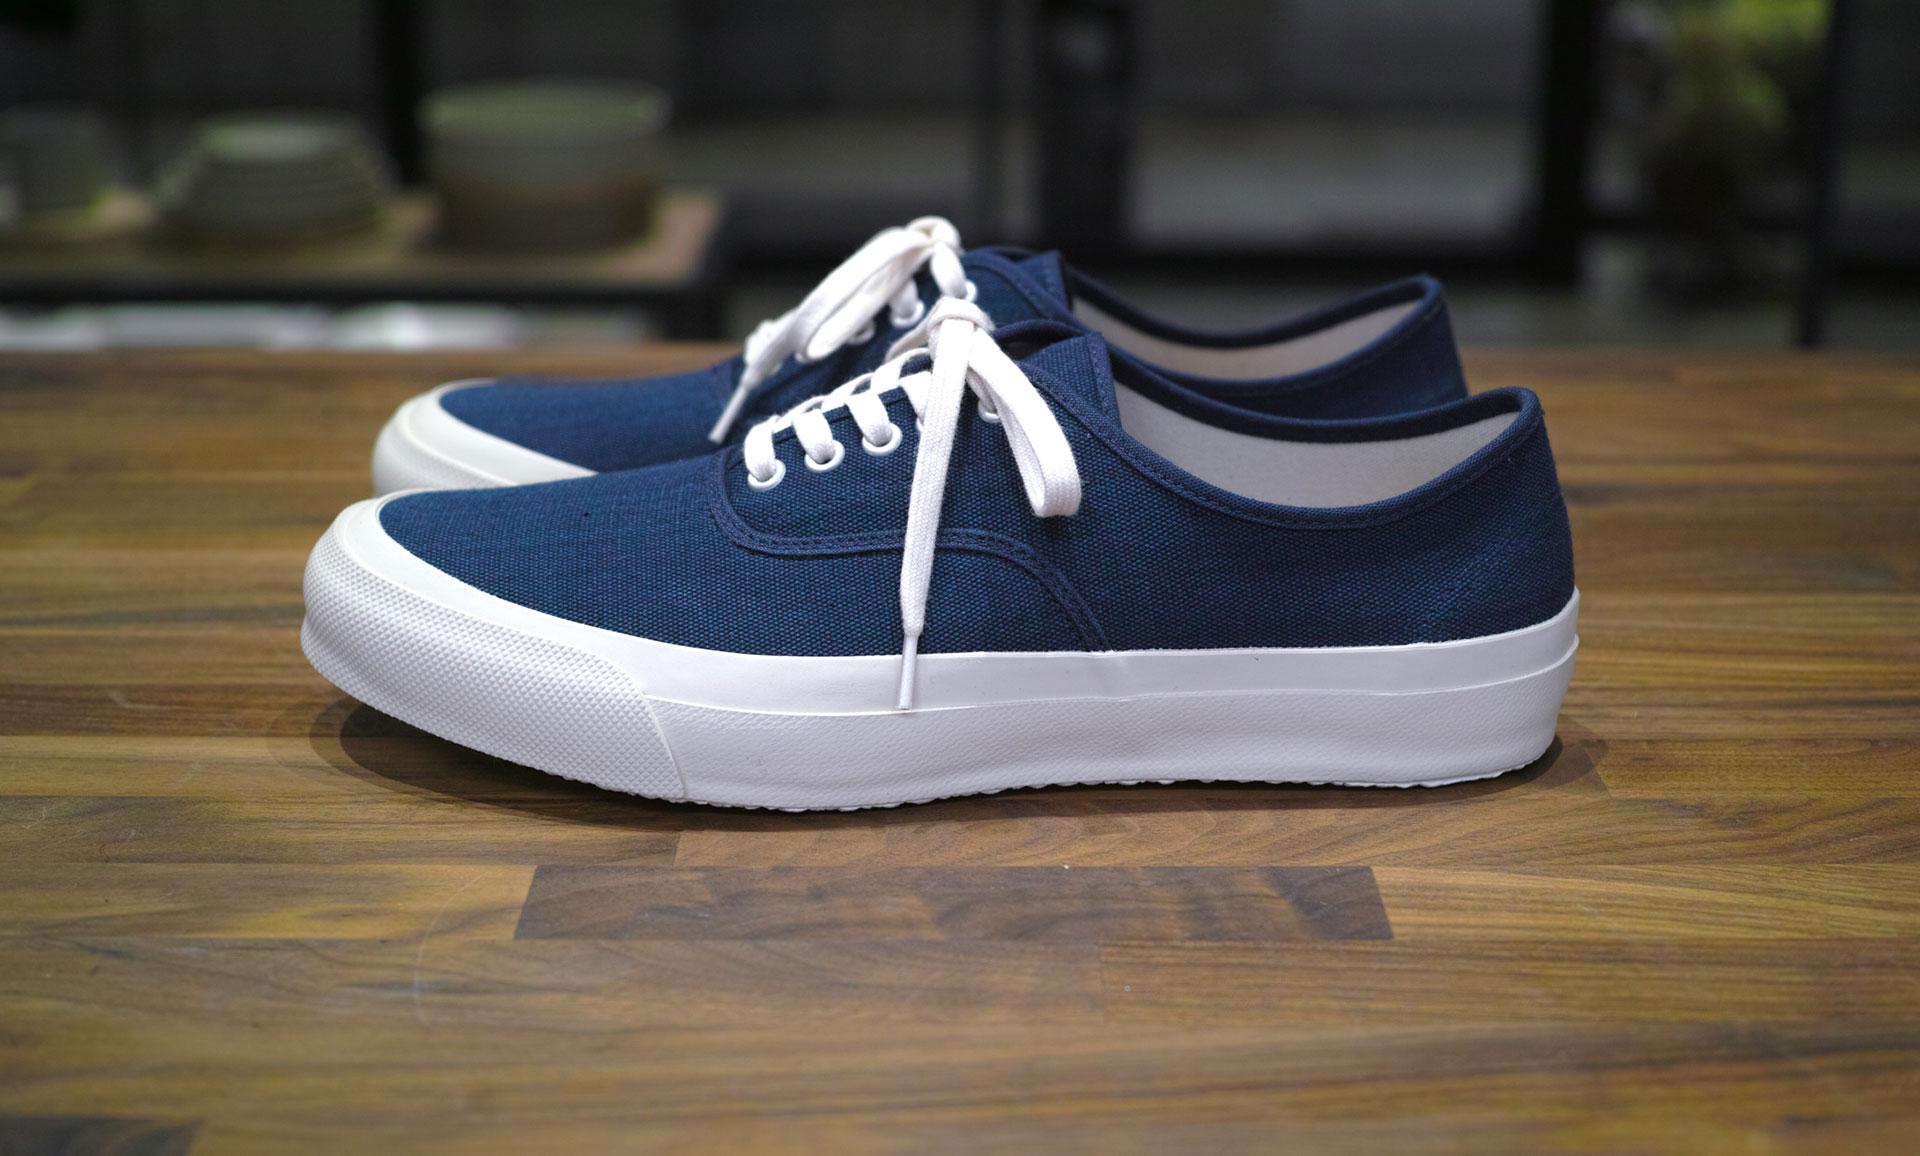 Doek oxford navy sneaker onthebooks - Doek doek ...